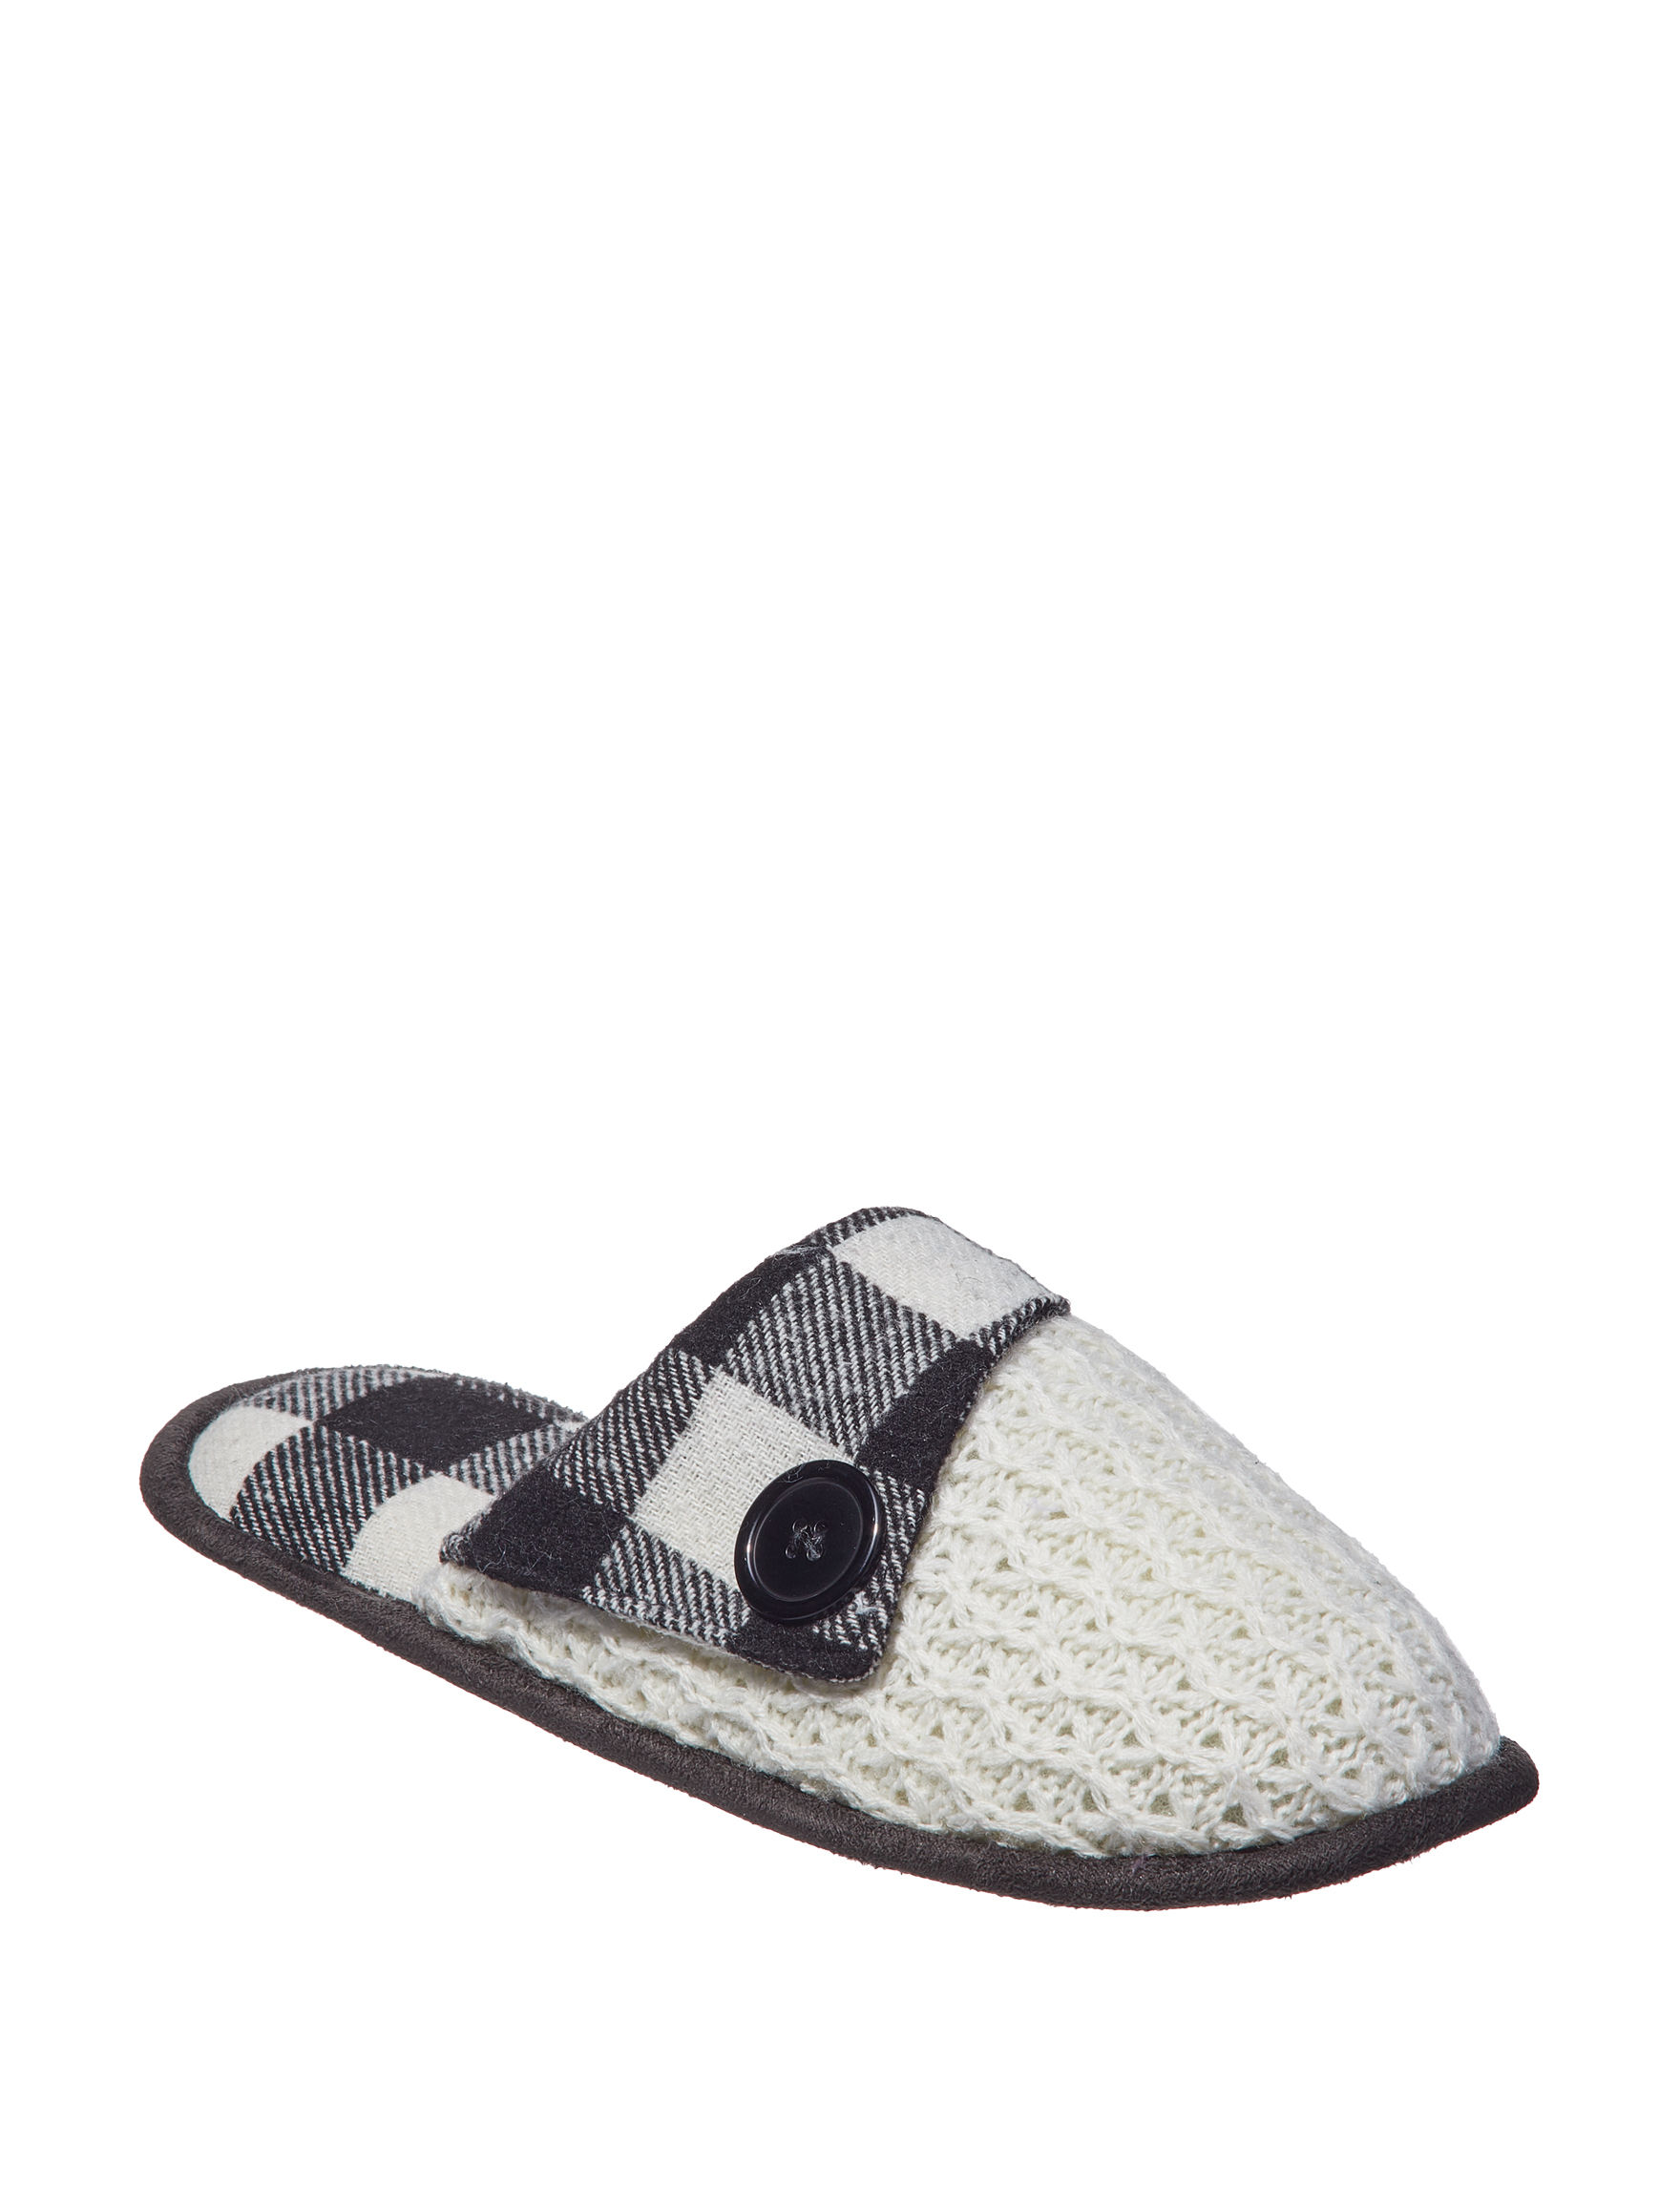 Sharper Image Black / White Slipper Shoes